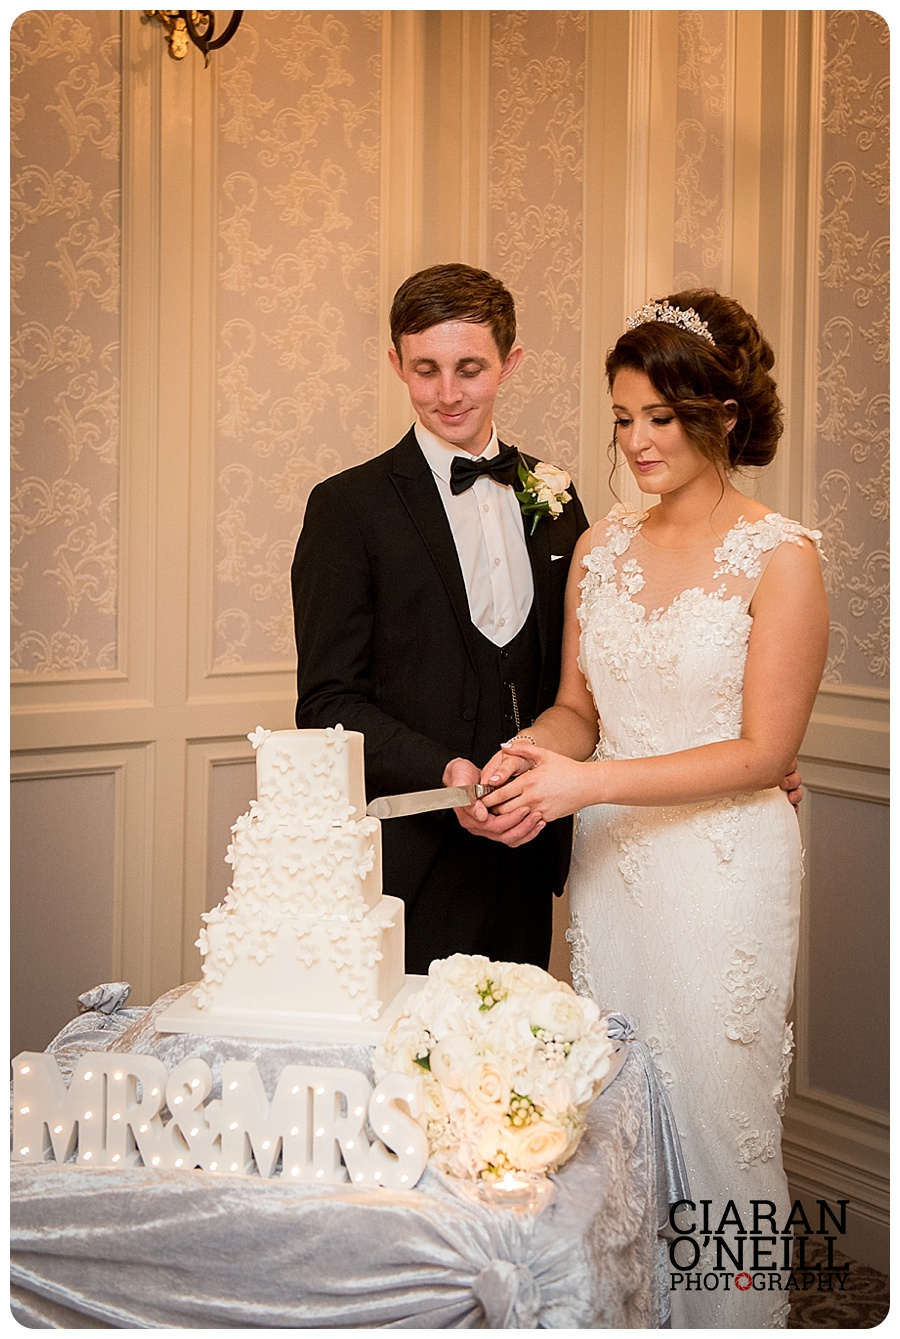 Emma & Turlough wedding at Carrickdale Hotel by Ciaran O'Neill Photography